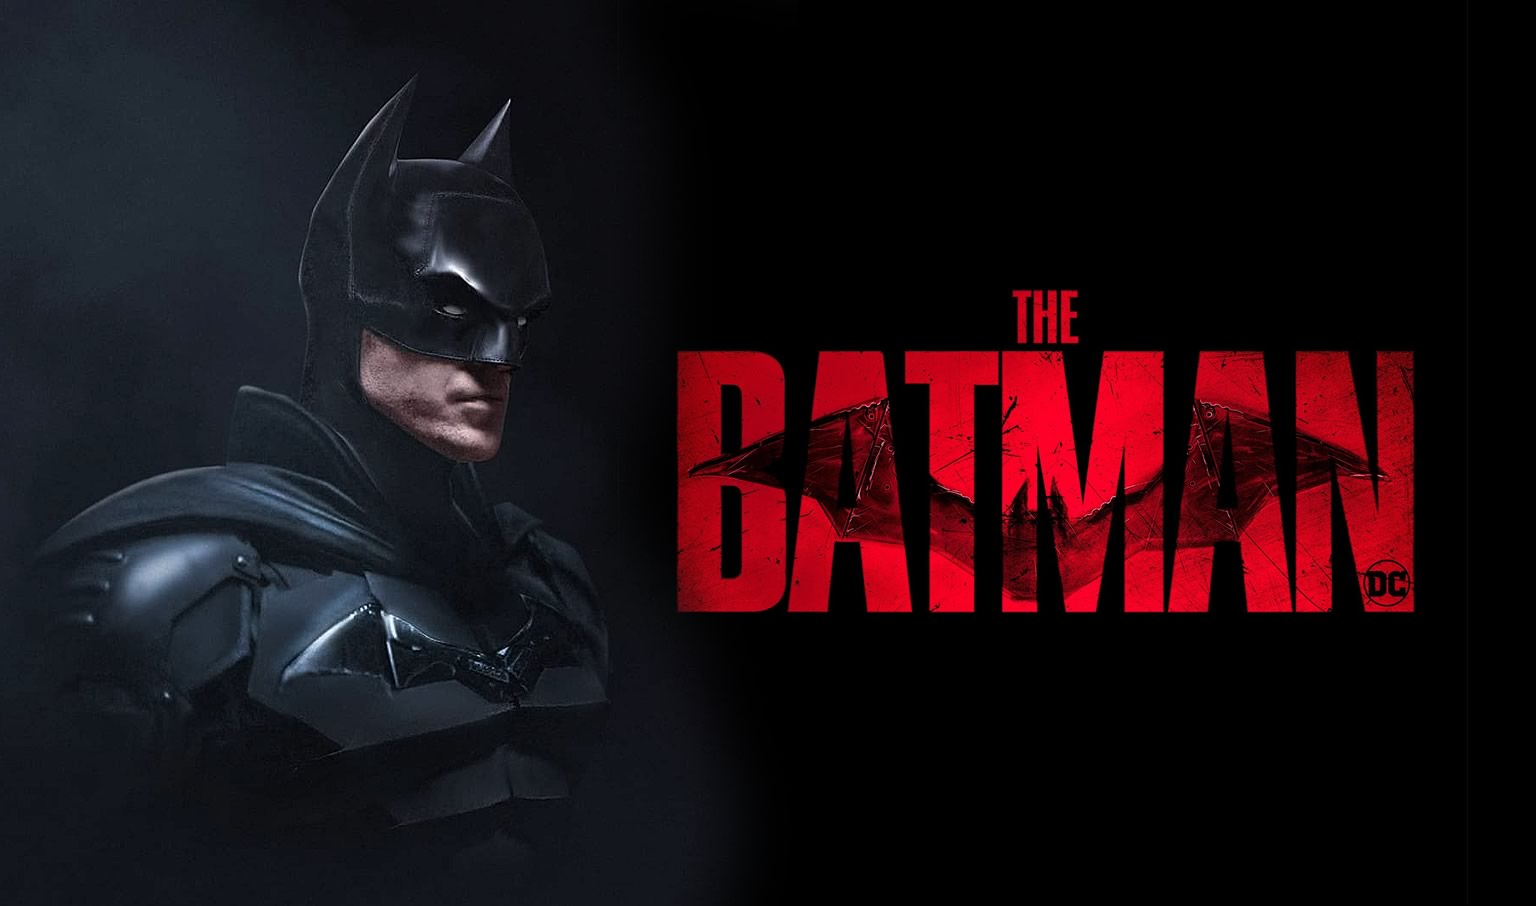 Batman | Robert Pattinson dublado pelo dublador brasileiro Wendel Bezerra